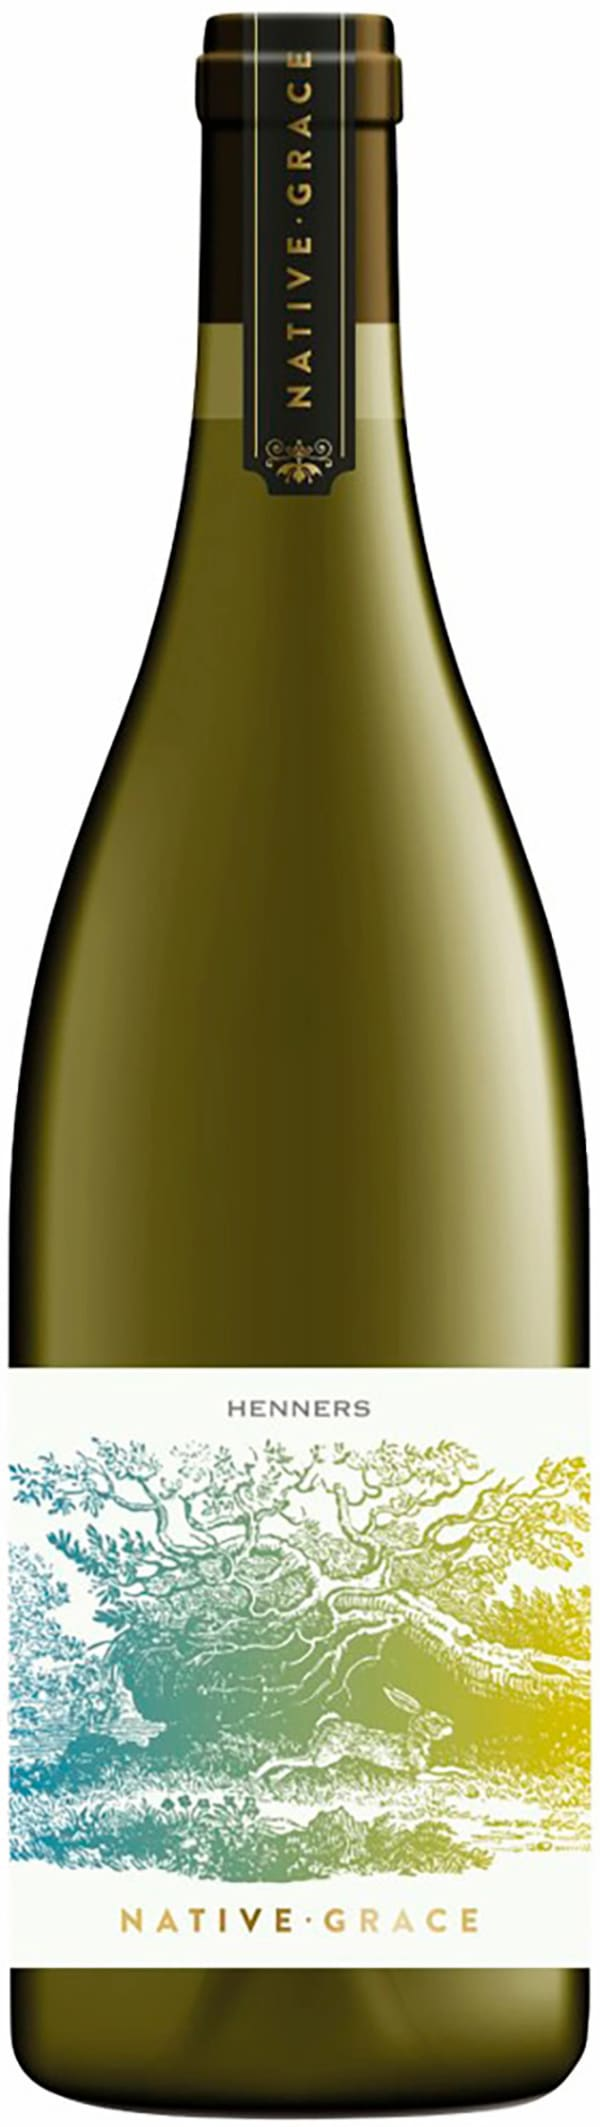 Henners Native Grace Chardonnay 2018